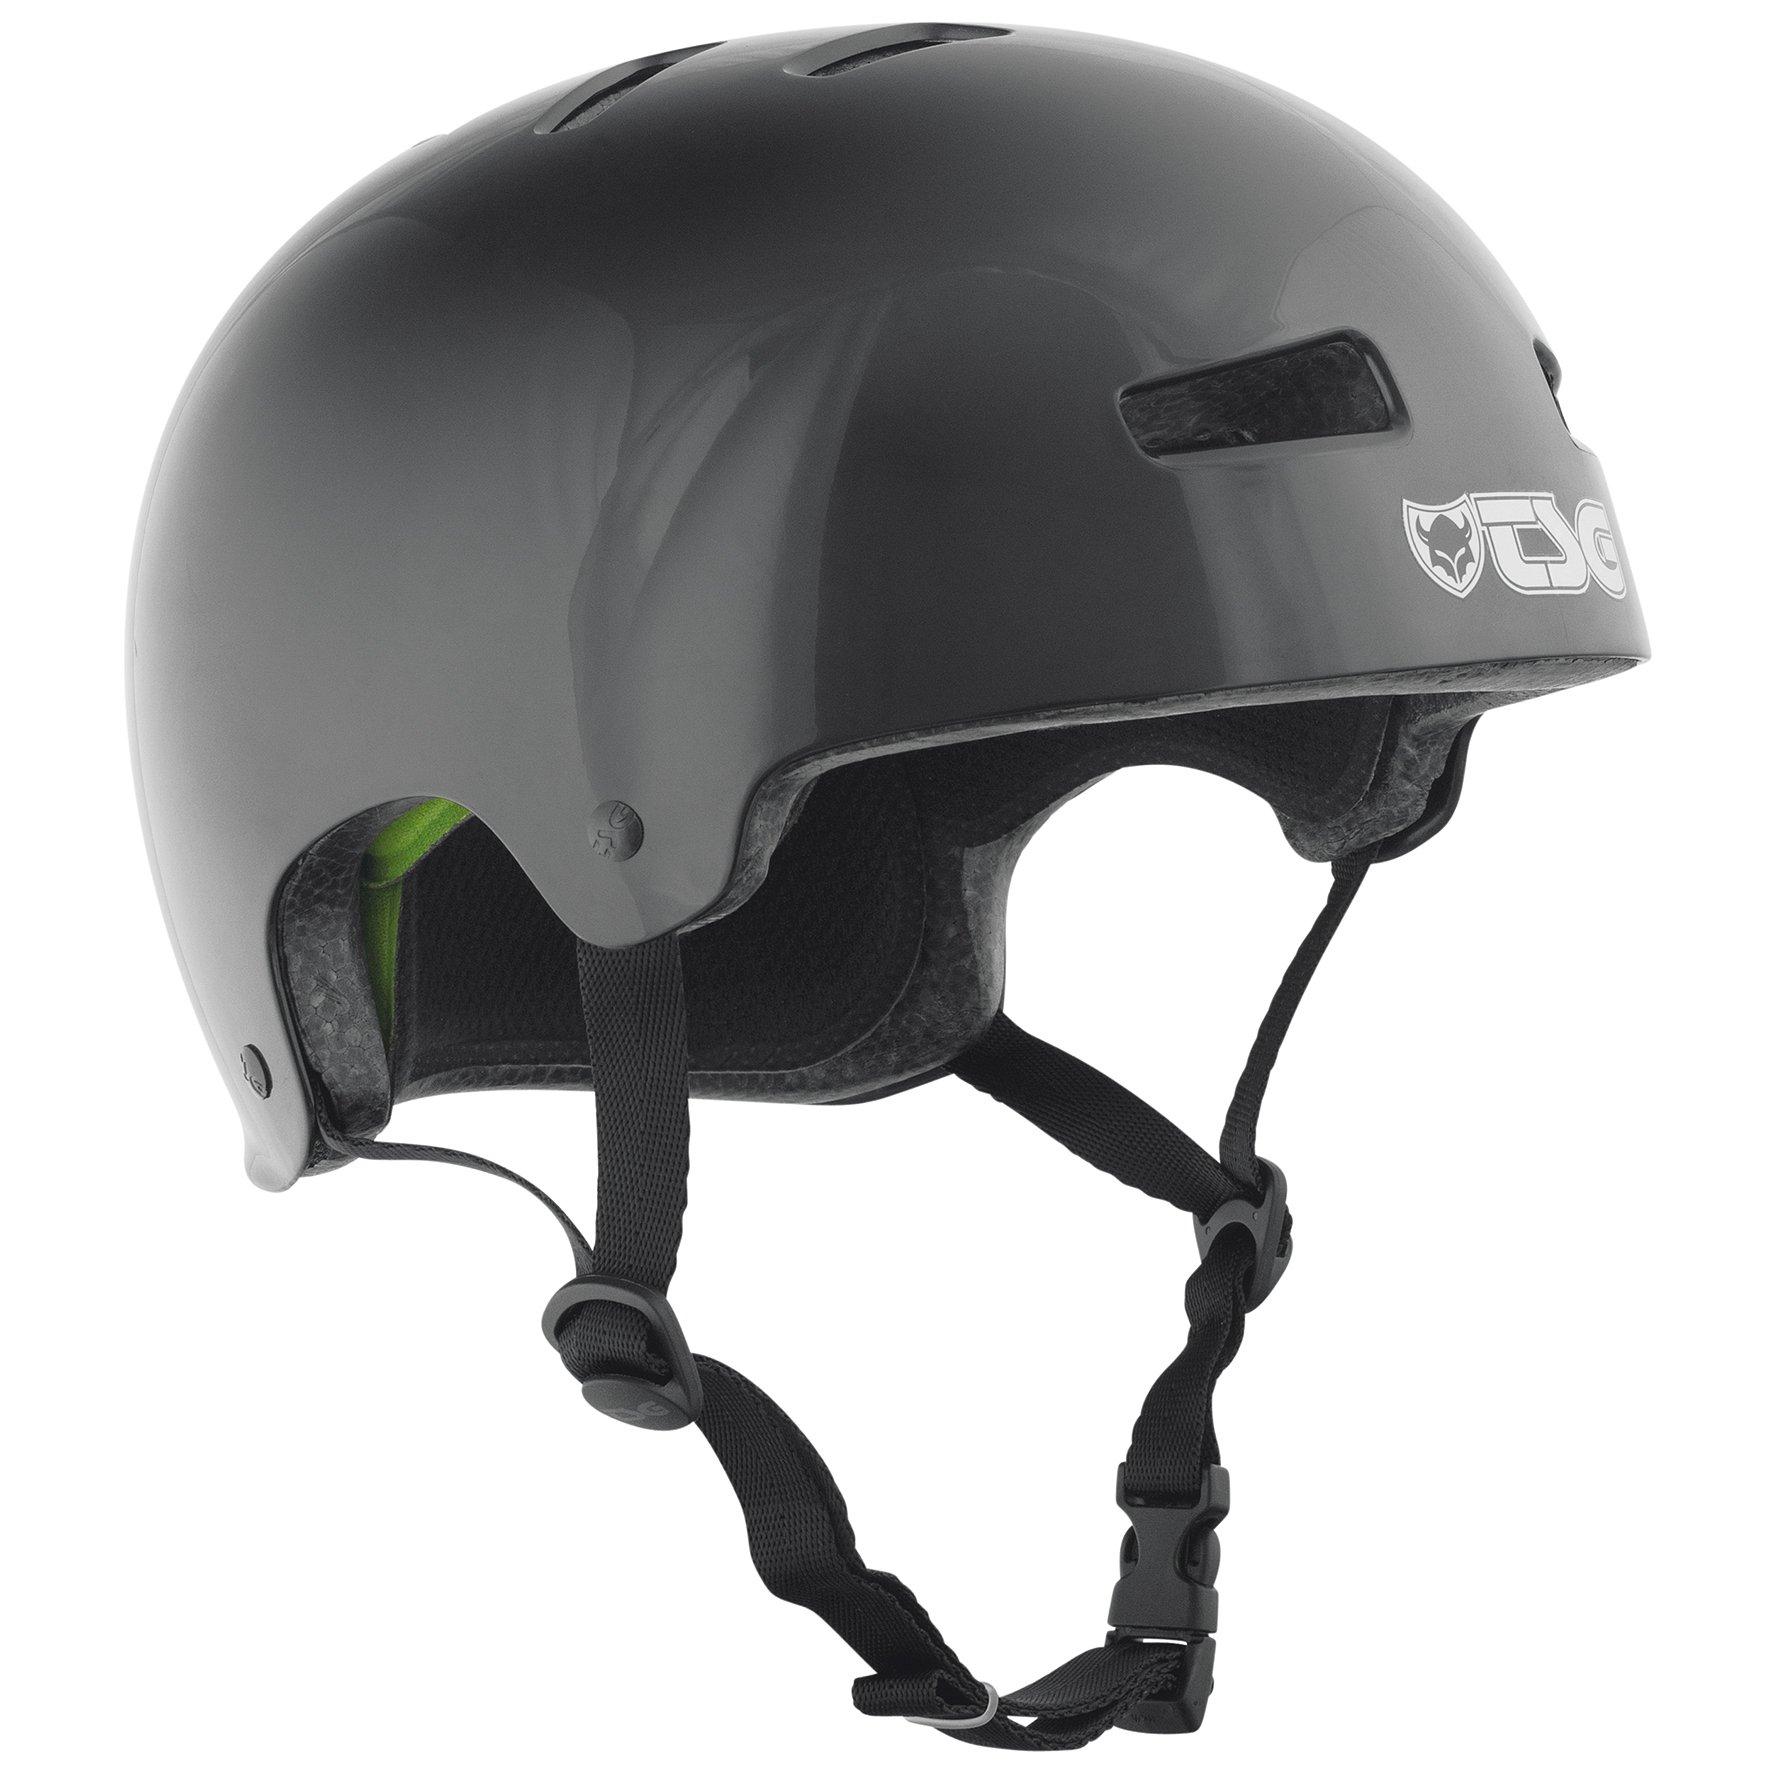 TSG - Evolution Injected Color (injected black, L/XL 57-59 cm) Helmet for Bicycle Skateboard